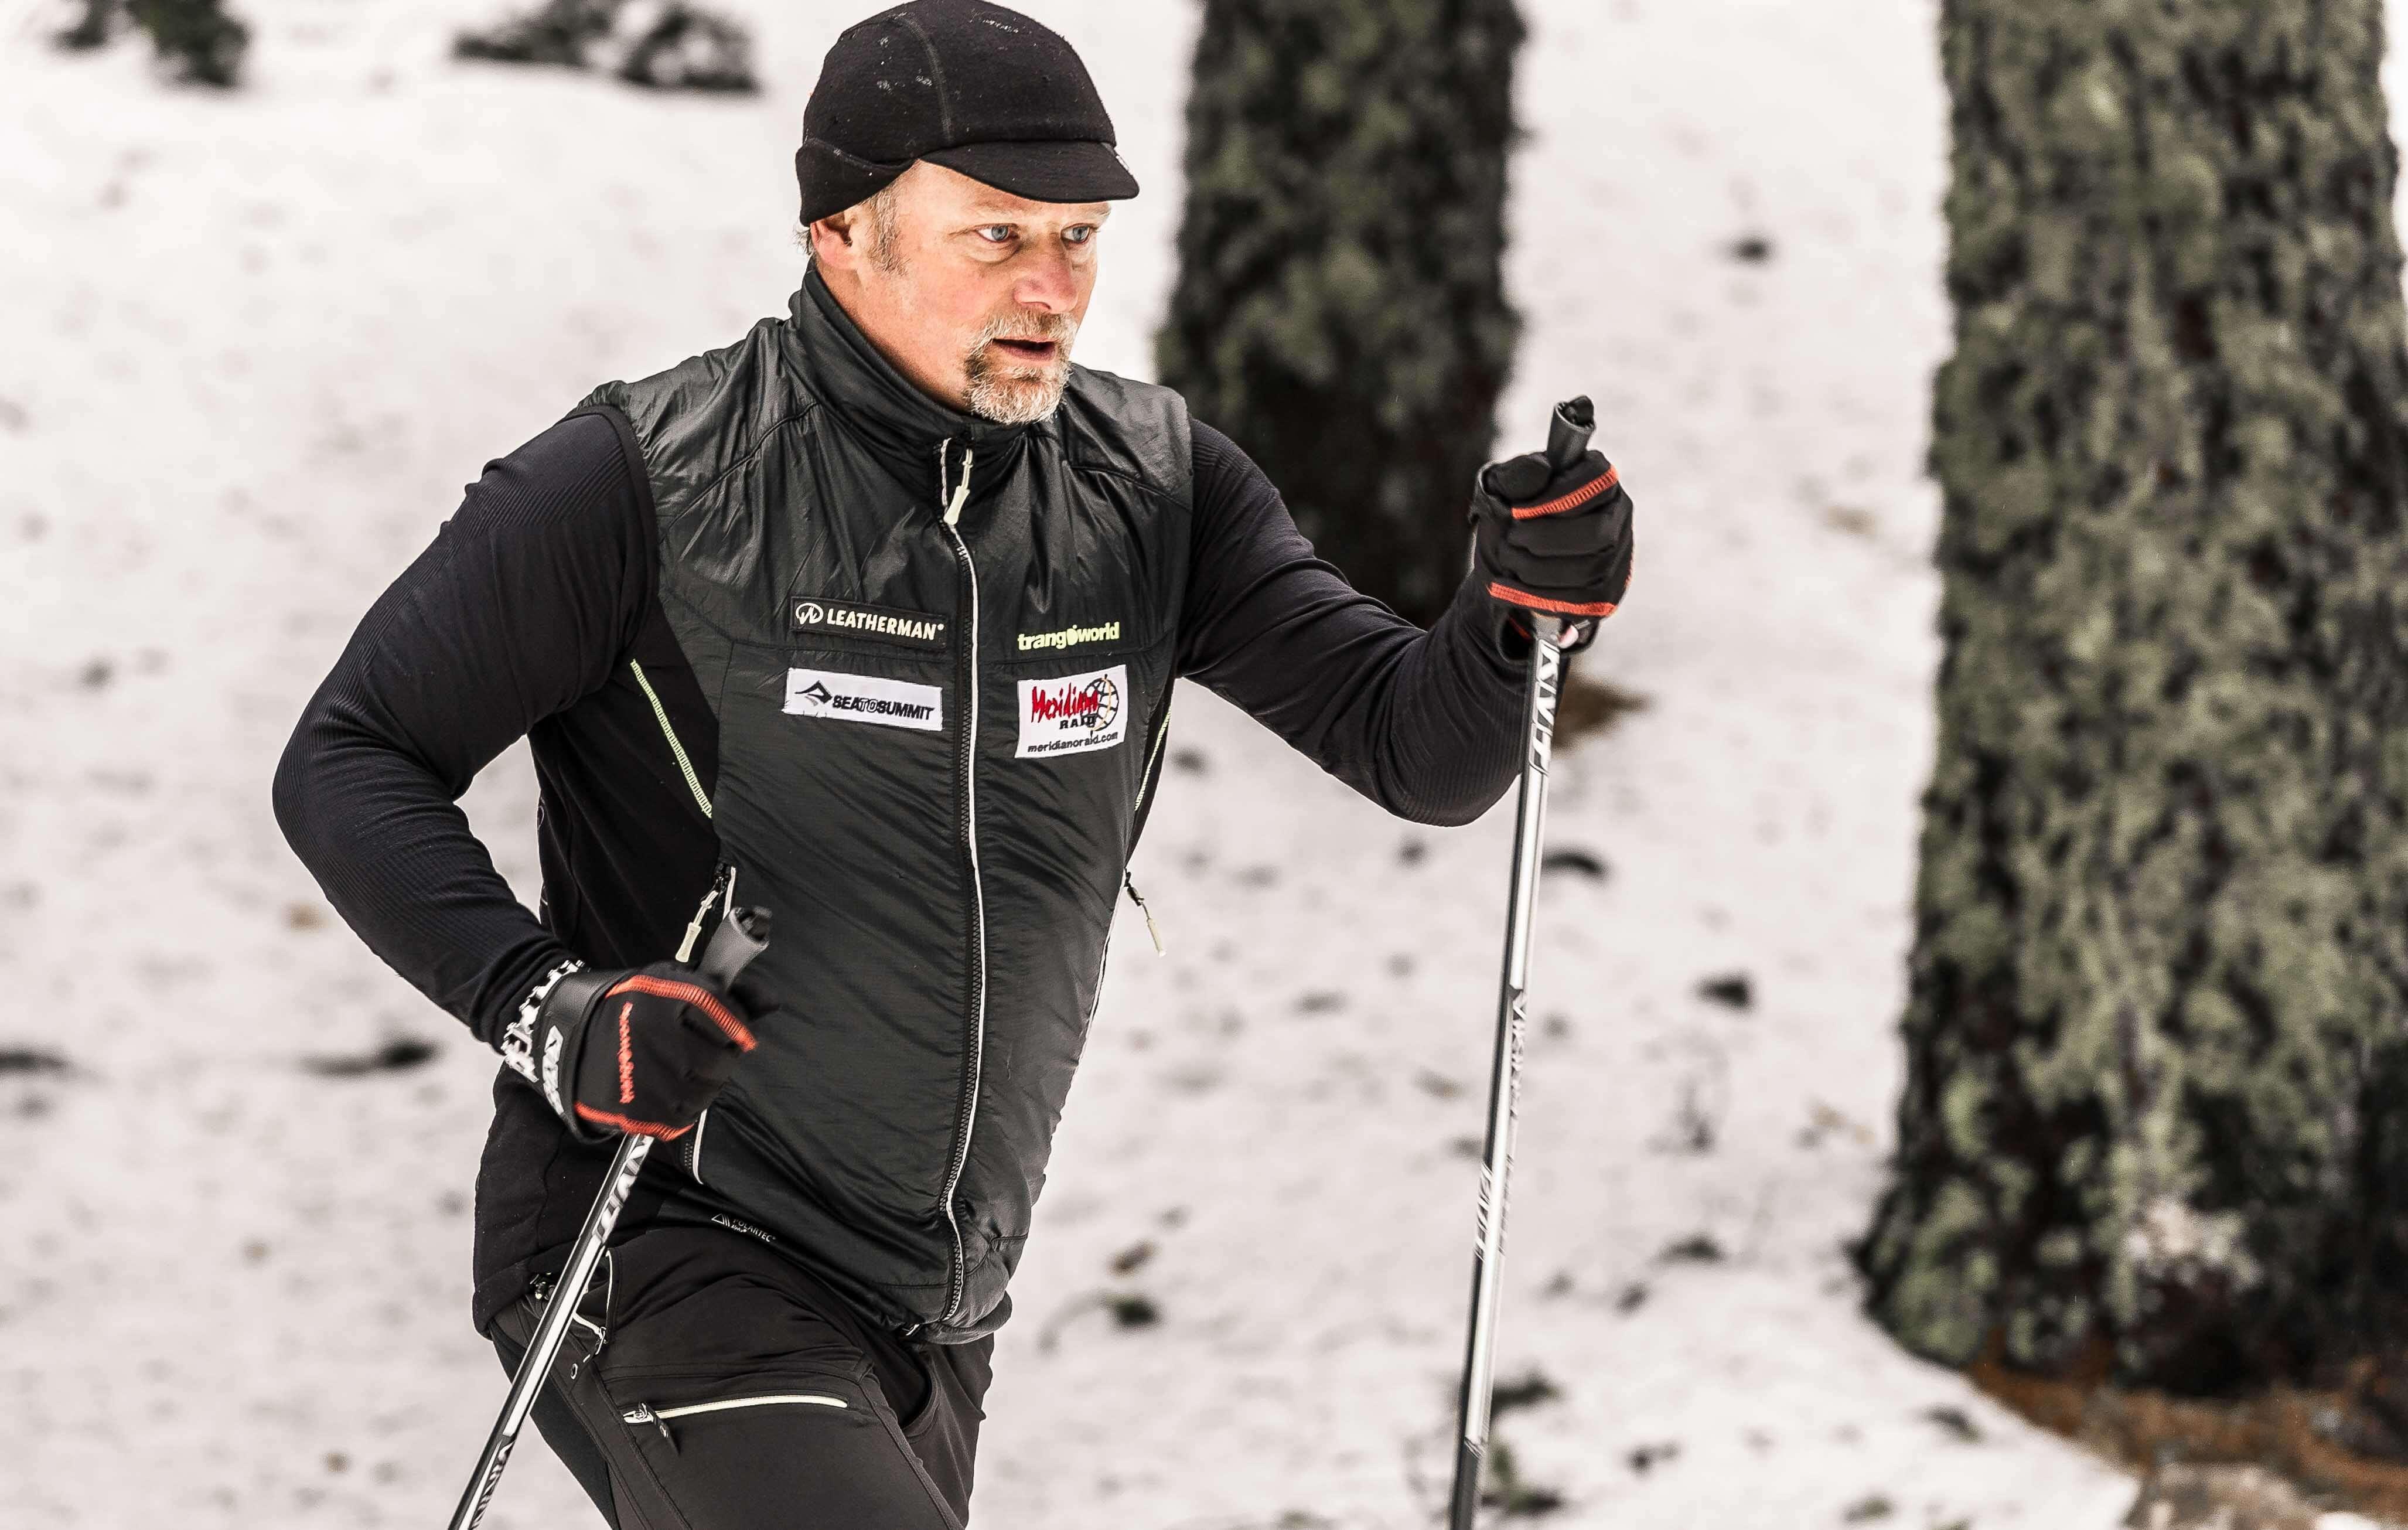 Antonio de la Rosa inició esta mañana la Lapland Extreme Challenge